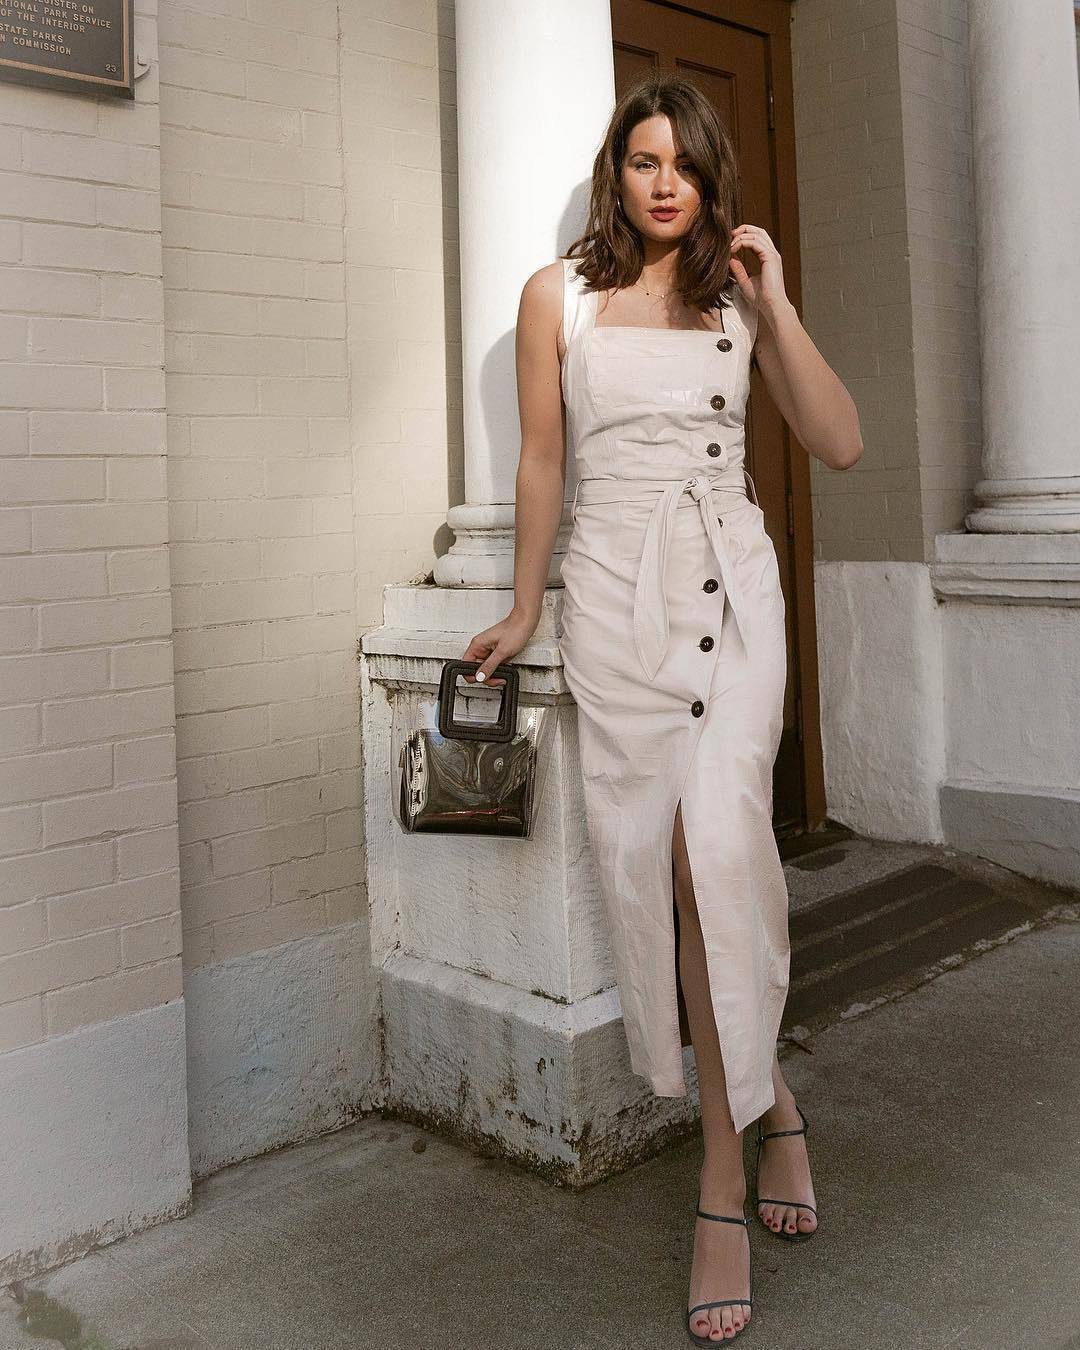 dress midi dress leather dress slit dress sandals handbag pvc black bag